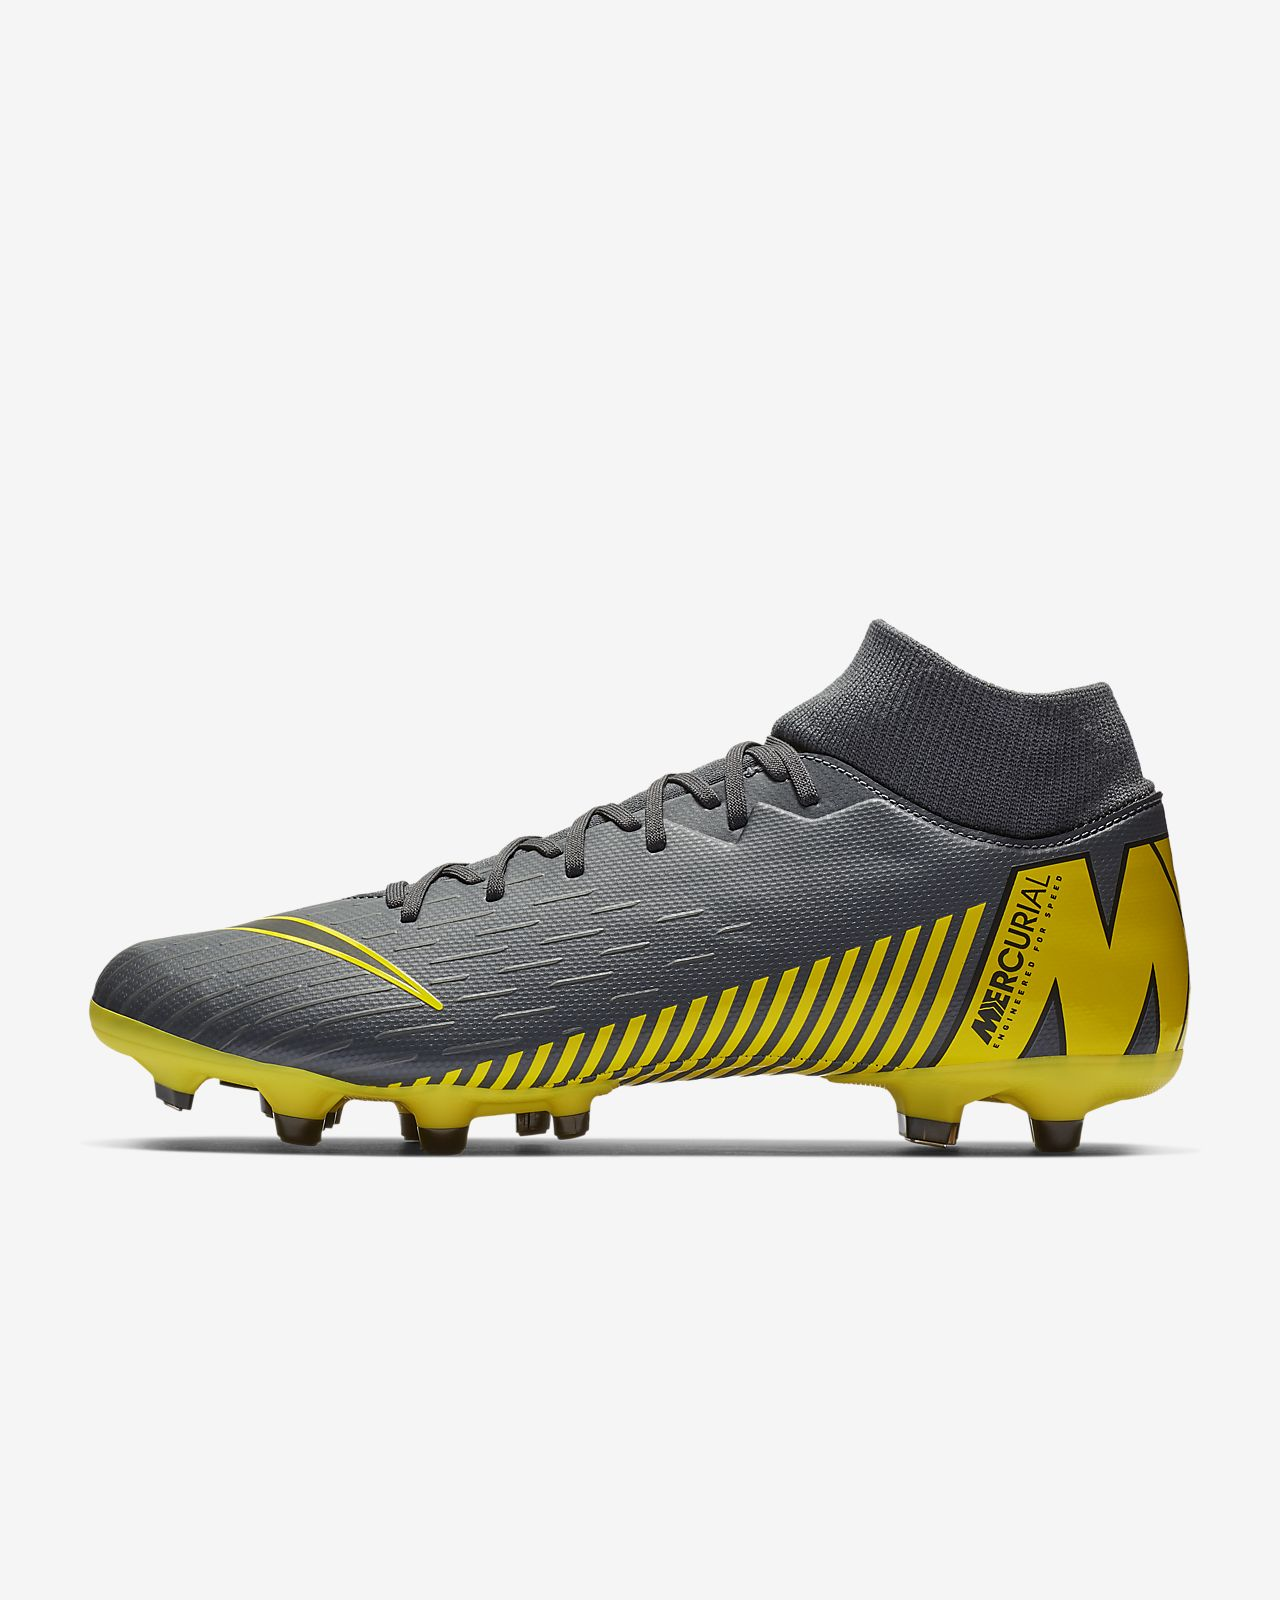 ... Calzado de fútbol para múltiples superficies Nike Mercurial Superfly 6  Academy MG fd0593a7dbe5e